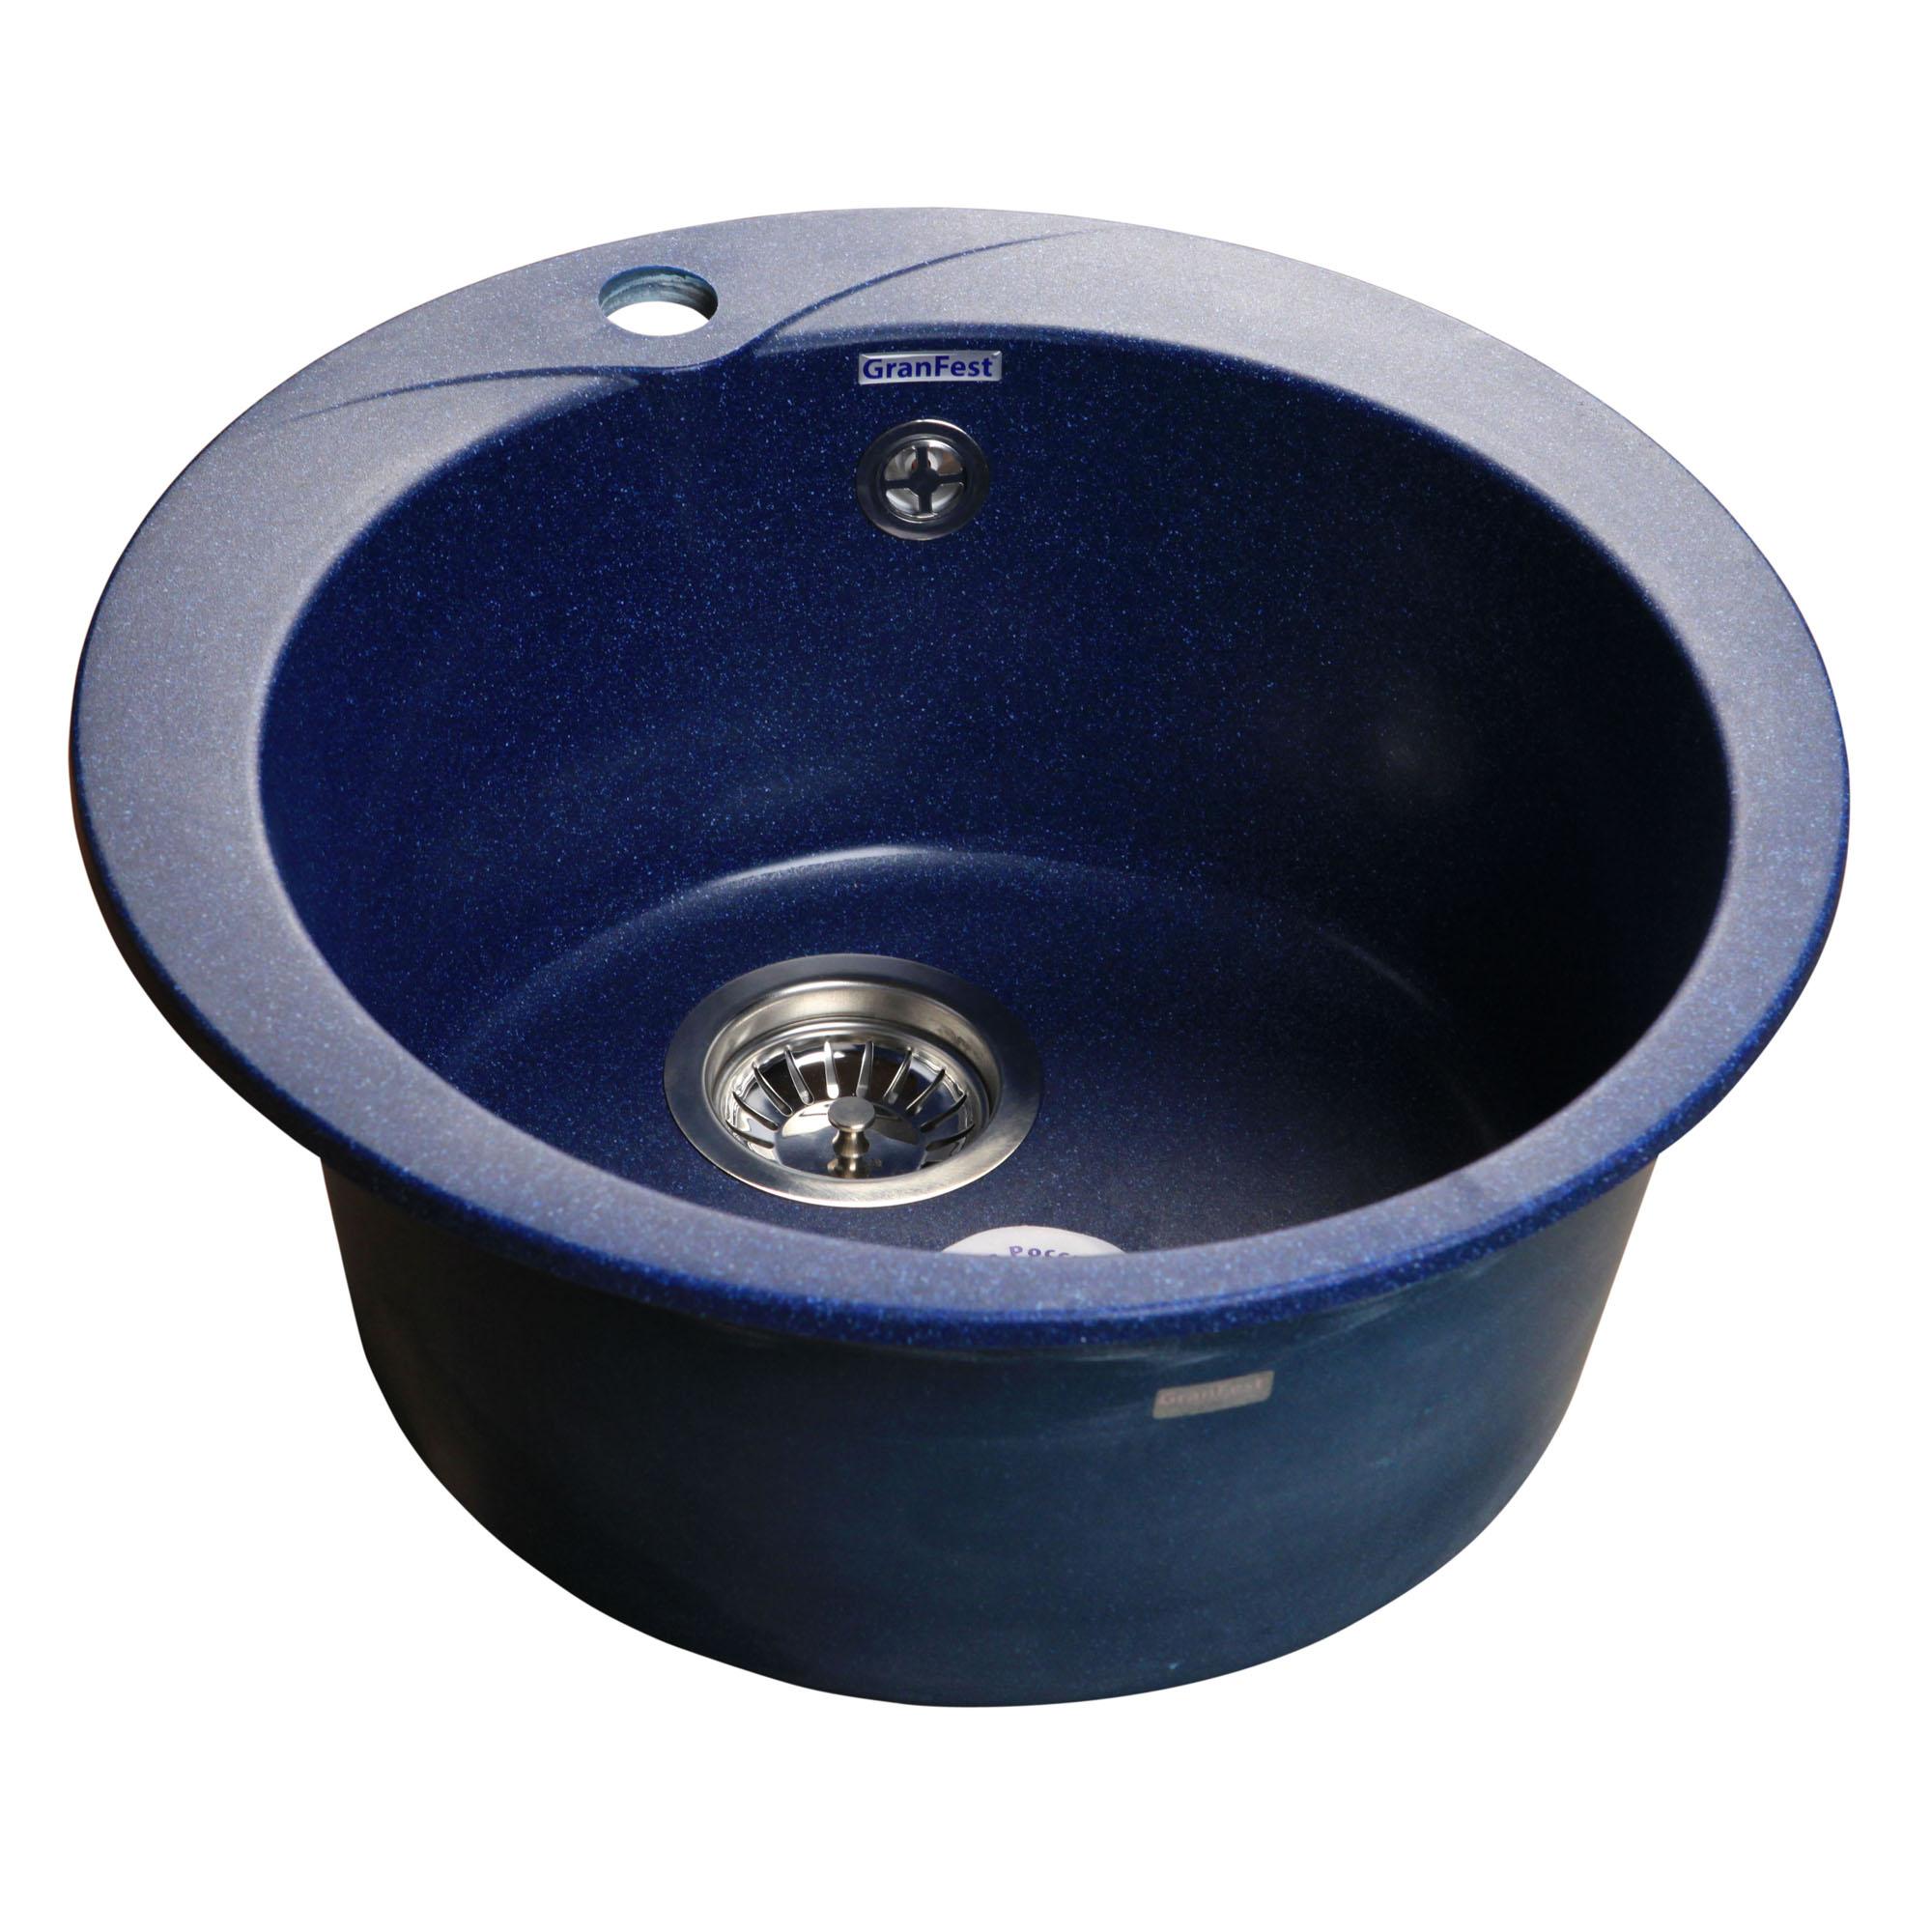 Кухонная мойка GranFest Rondo GF-R480 синий мойка кухонная granfest gf r480 терракот d480